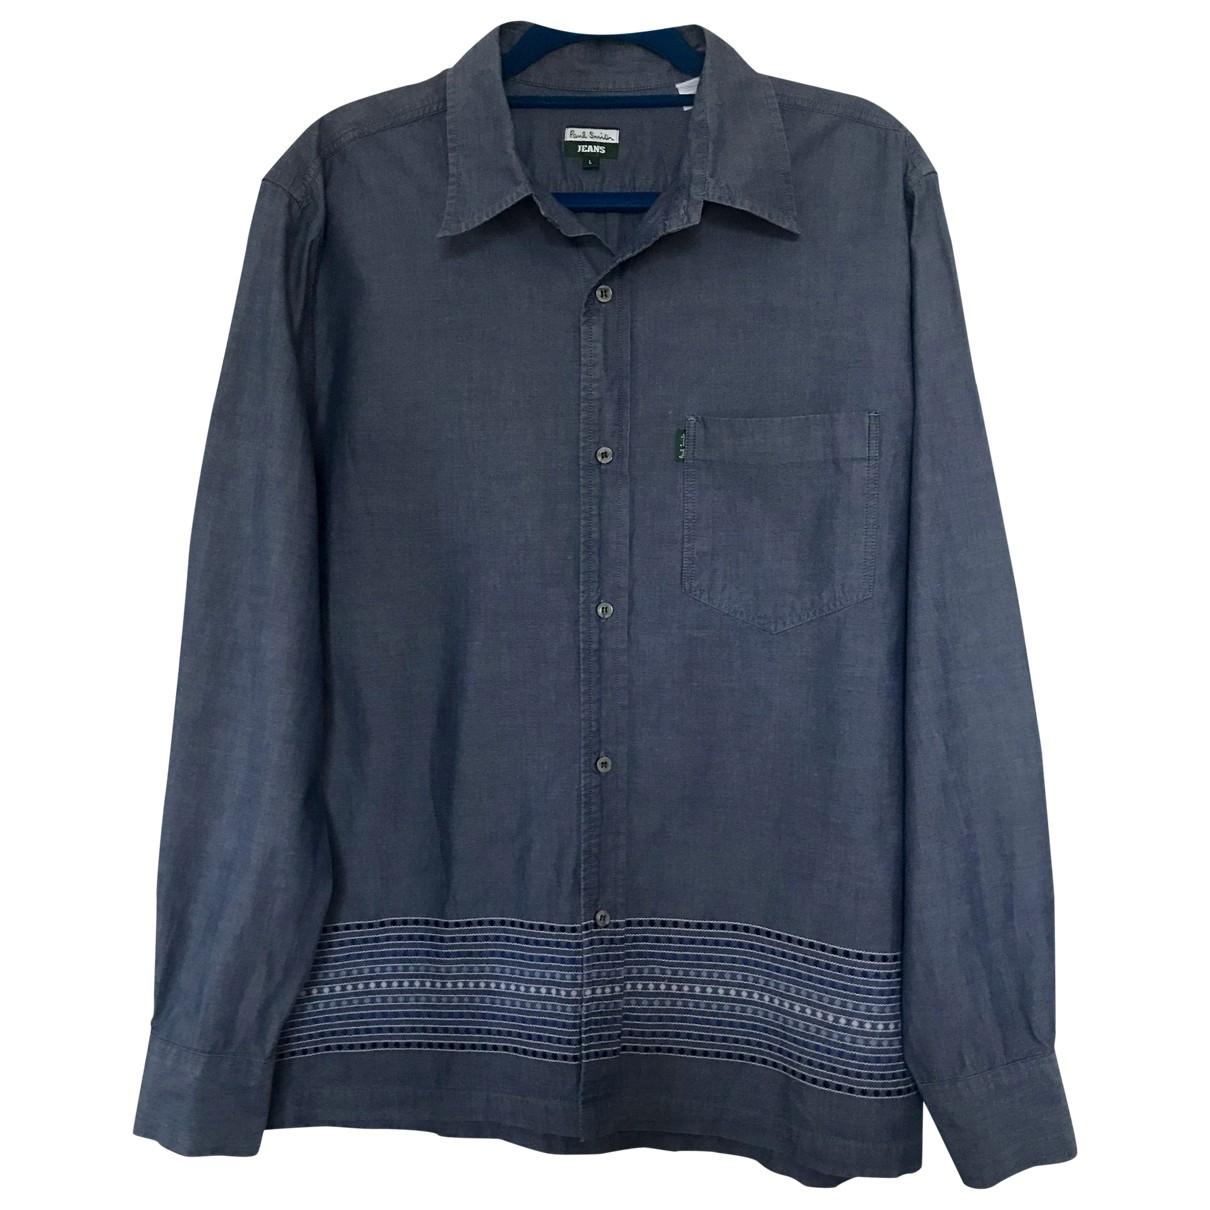 Paul Smith \N Blue Cotton Shirts for Men L International